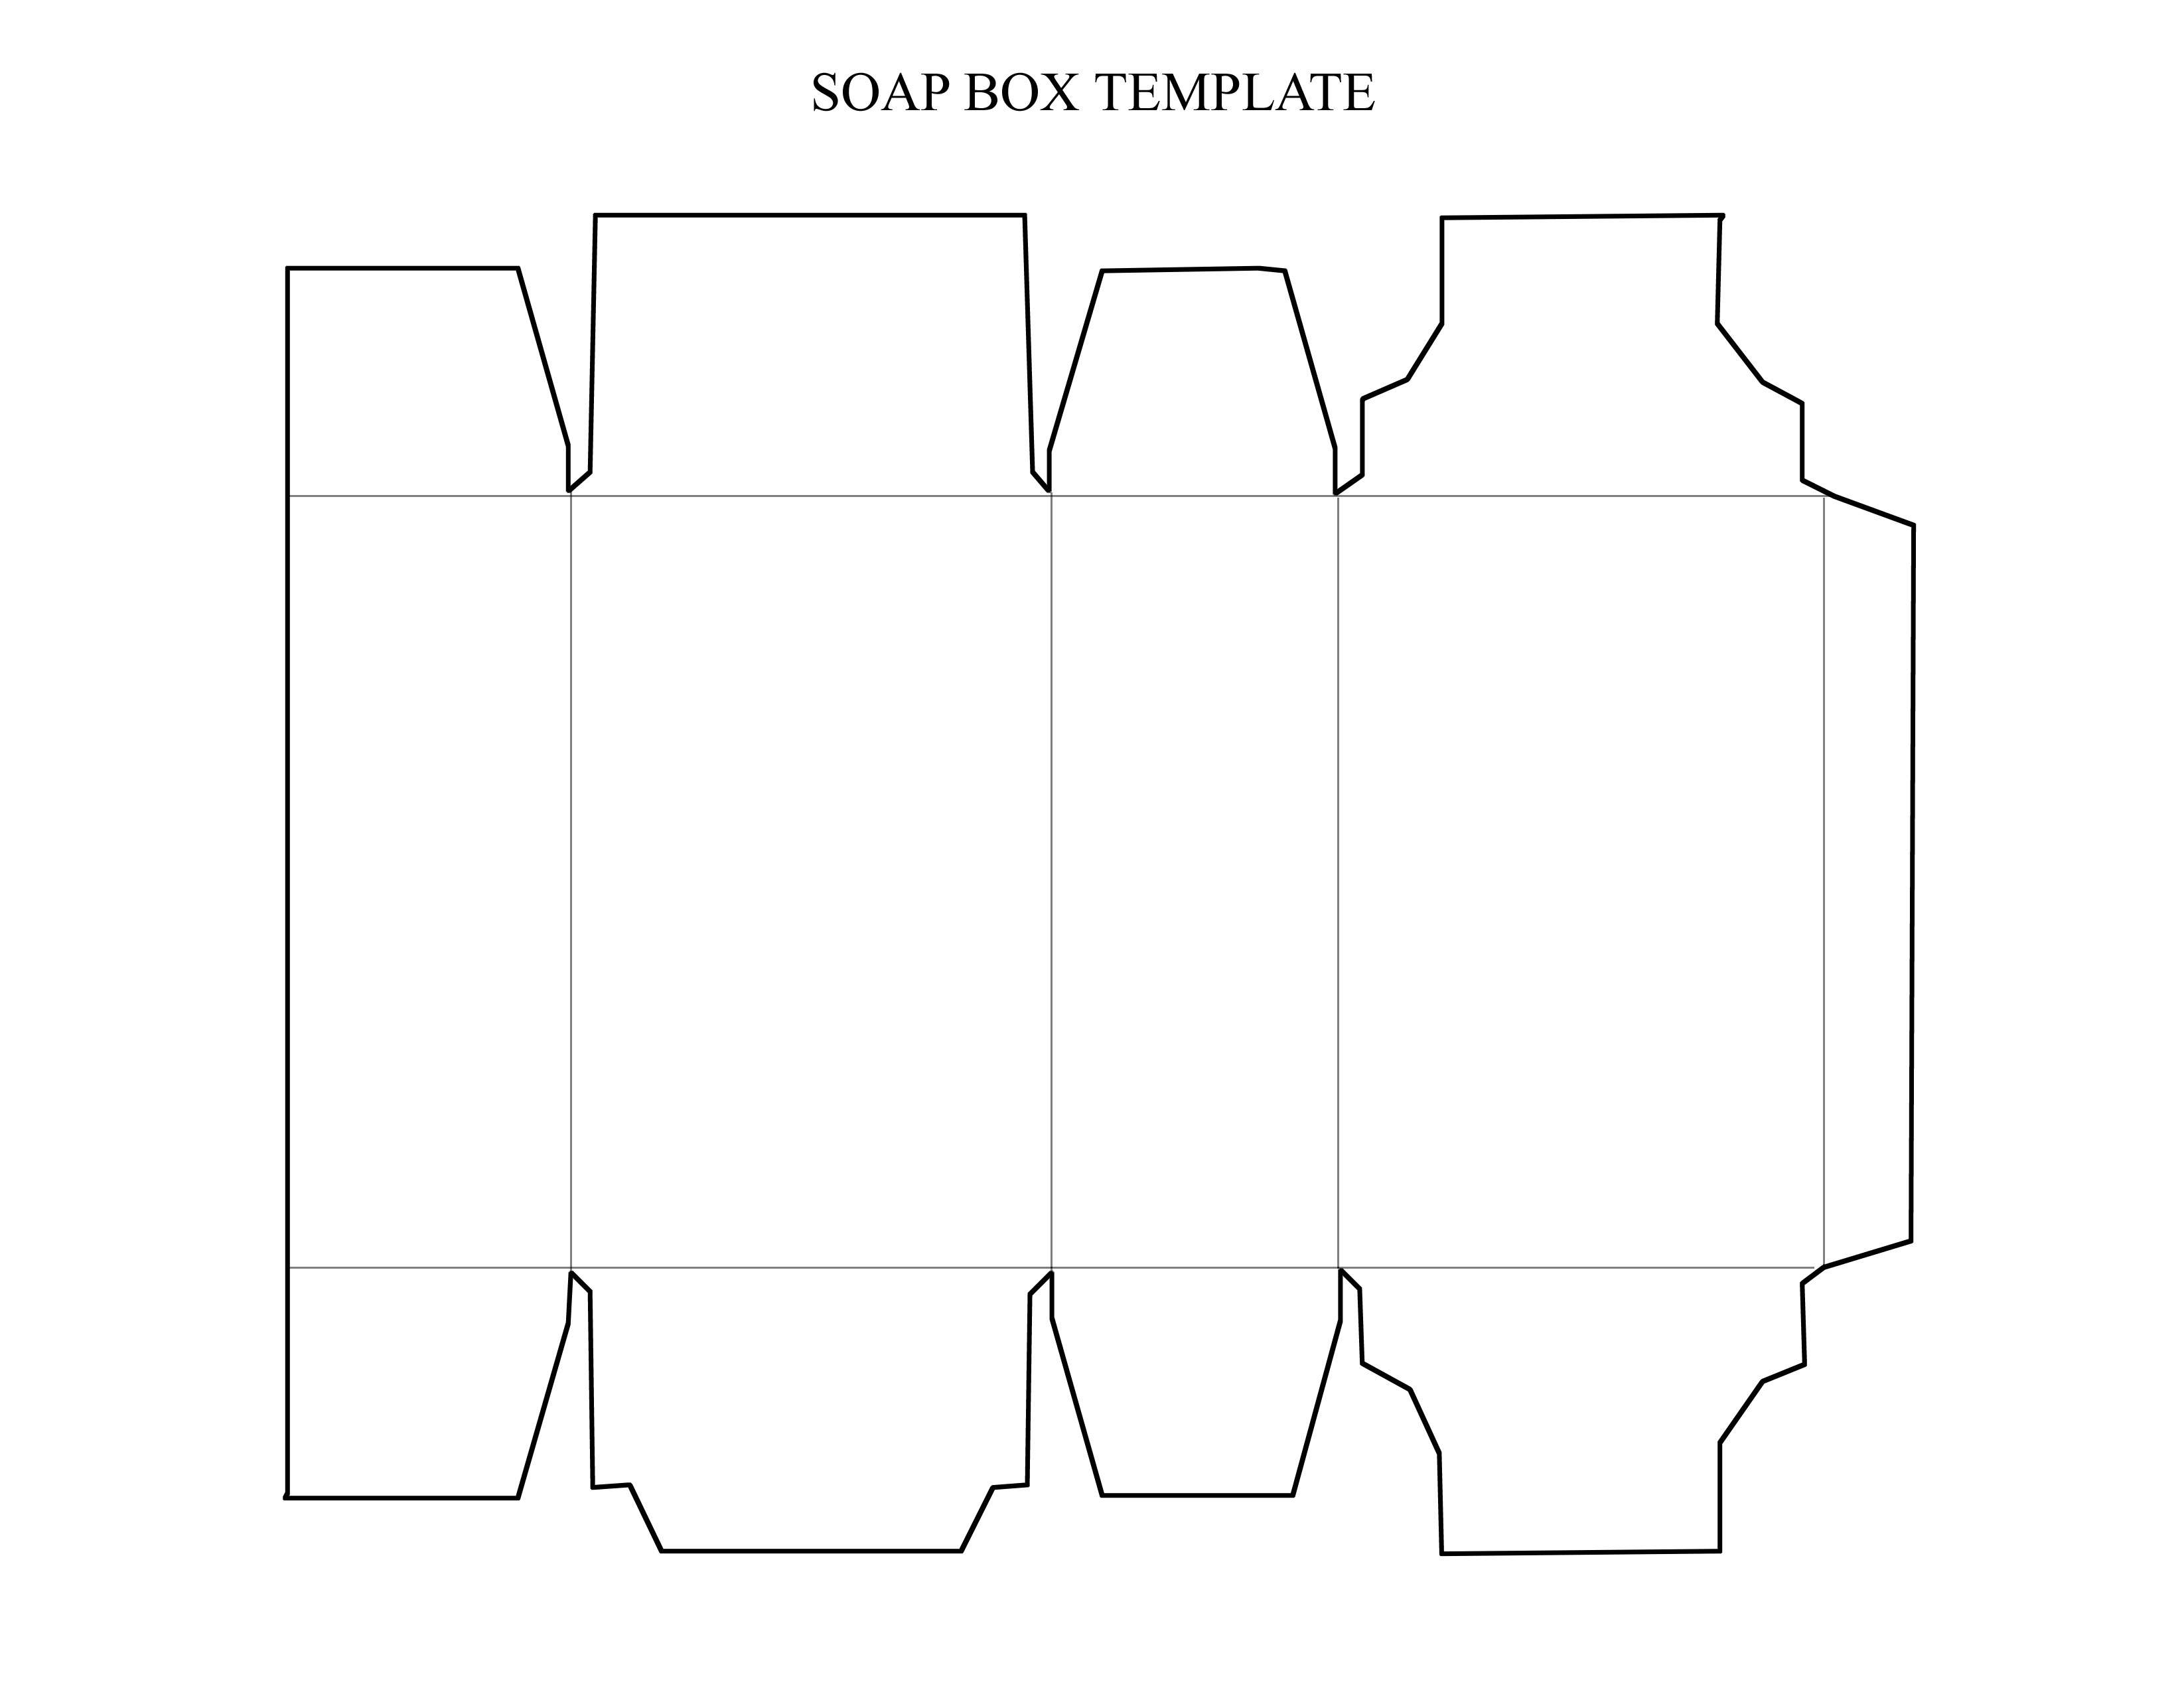 templates soapbox template